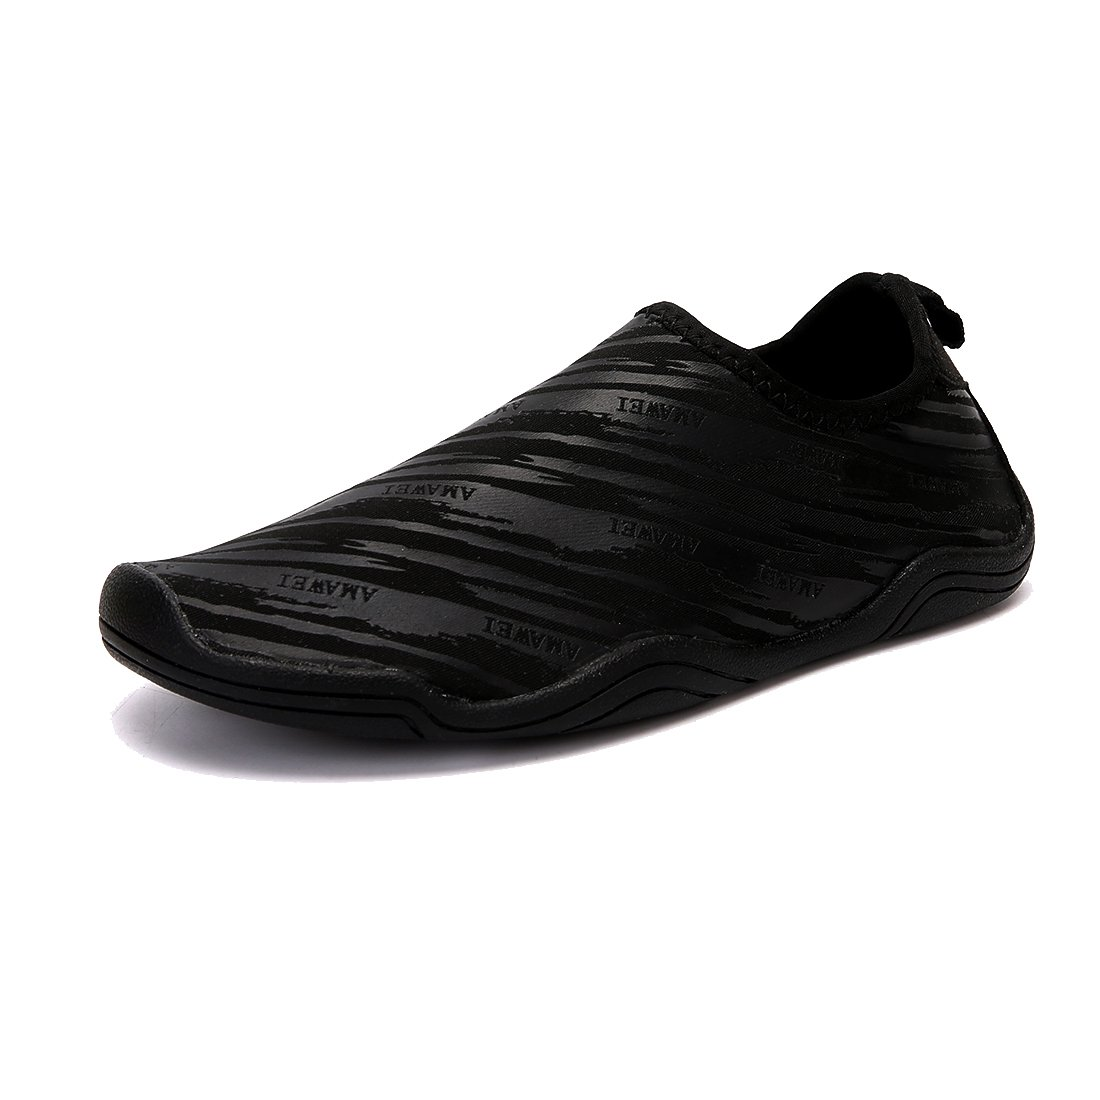 VAMV Water Shoes for Kids Boys Girls Quick Drying Beach Swim Shoe Sneakers Slip On Aqua Sock(Little Kid/Big Kid) (6, Black)